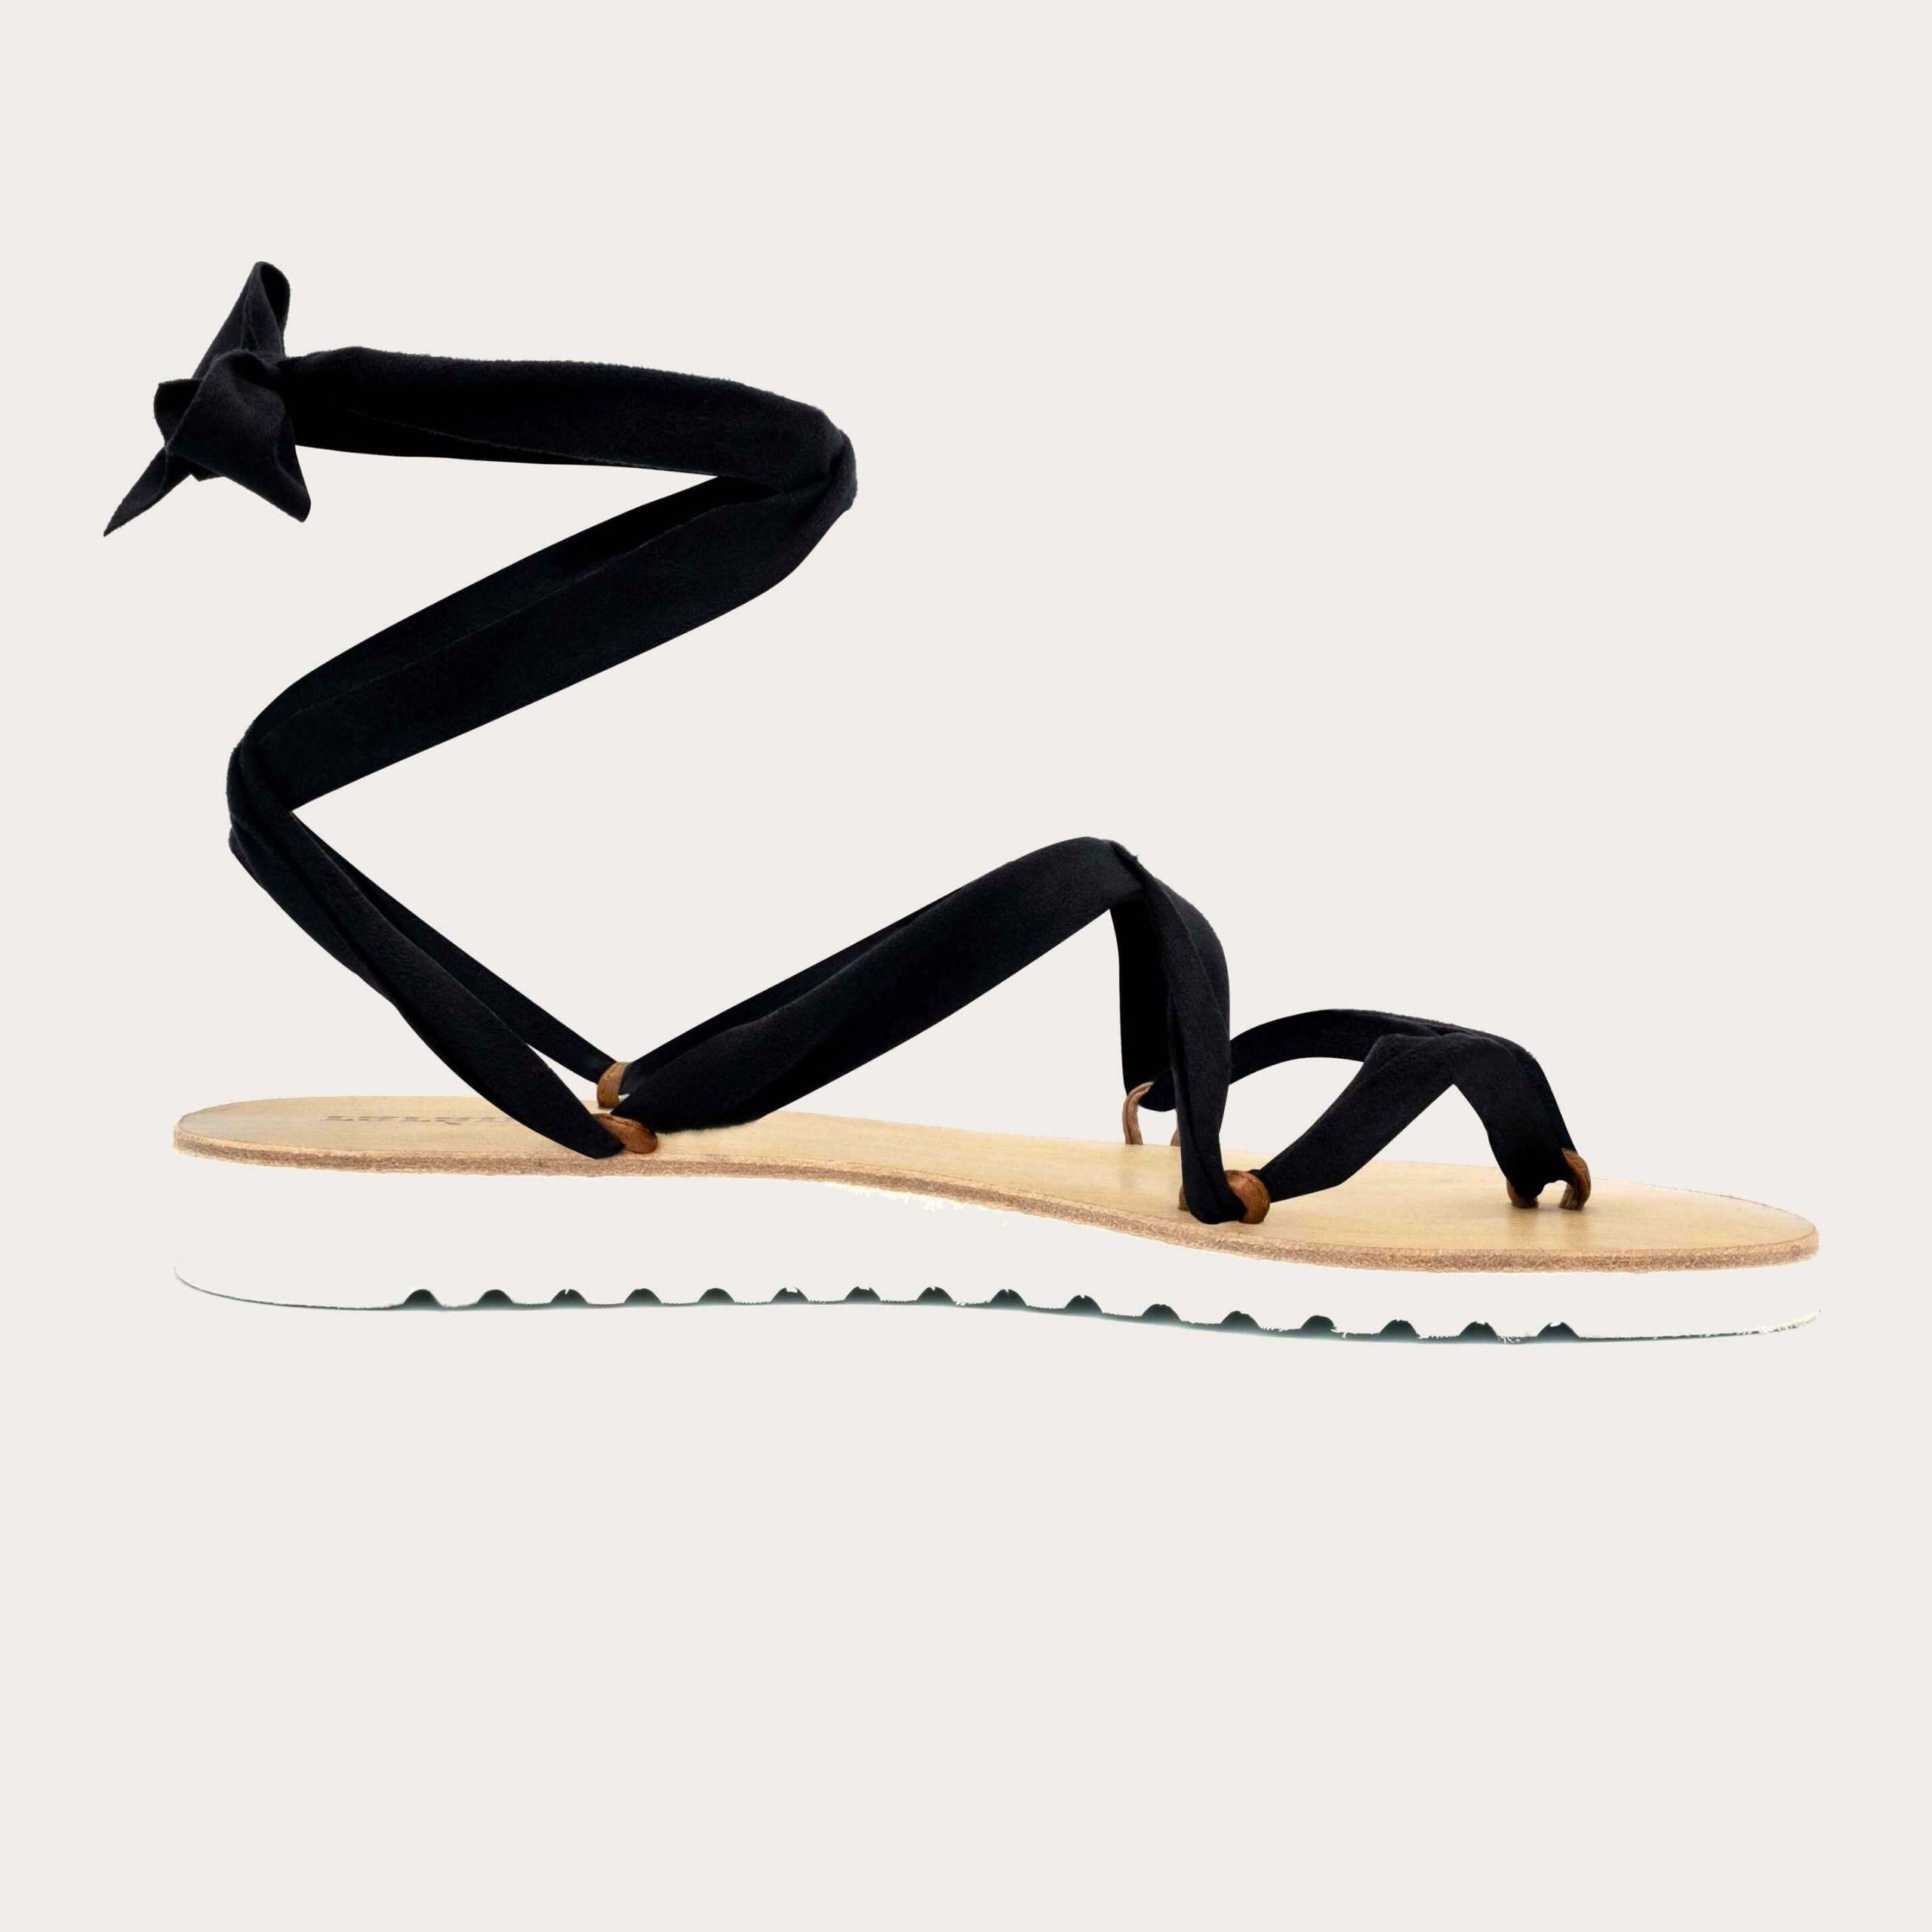 chalco-1_lintsandalen sandals travelsandals vegan sustainable sandals wikkelsandalen